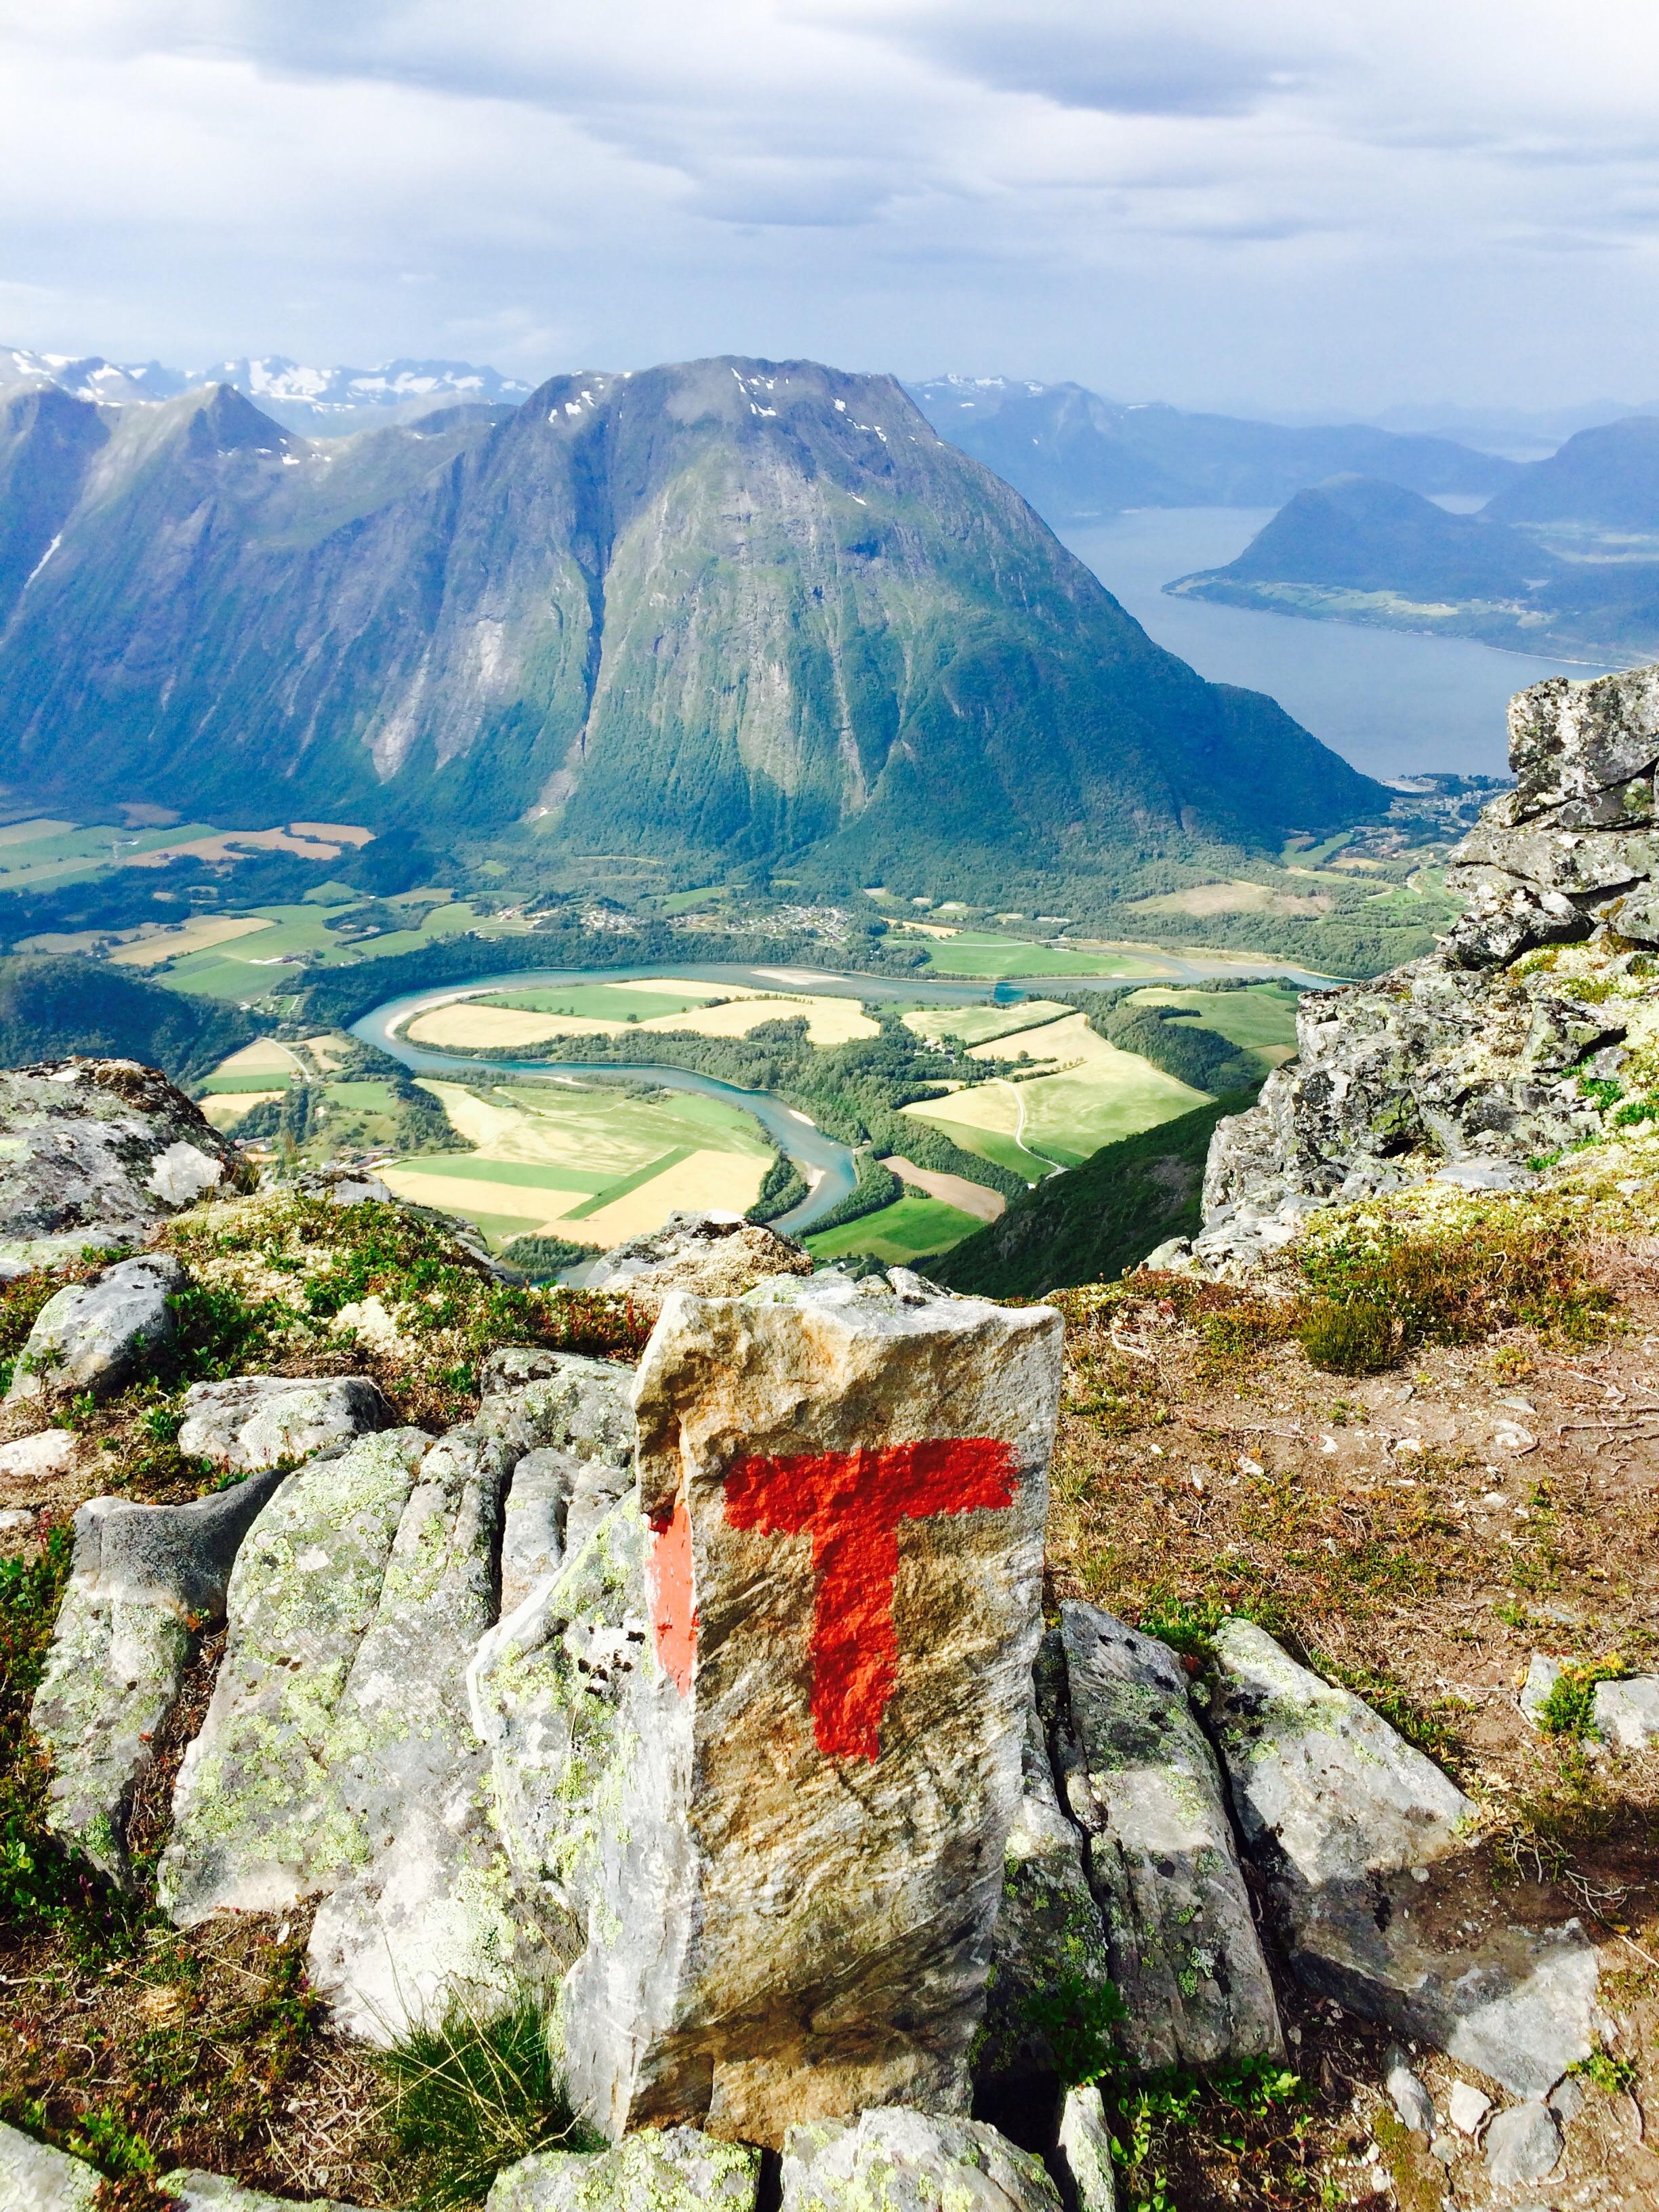 Følg t-ene i fjellet.                            Foto: Cathrine Knudsen/Den Norske Turistforening